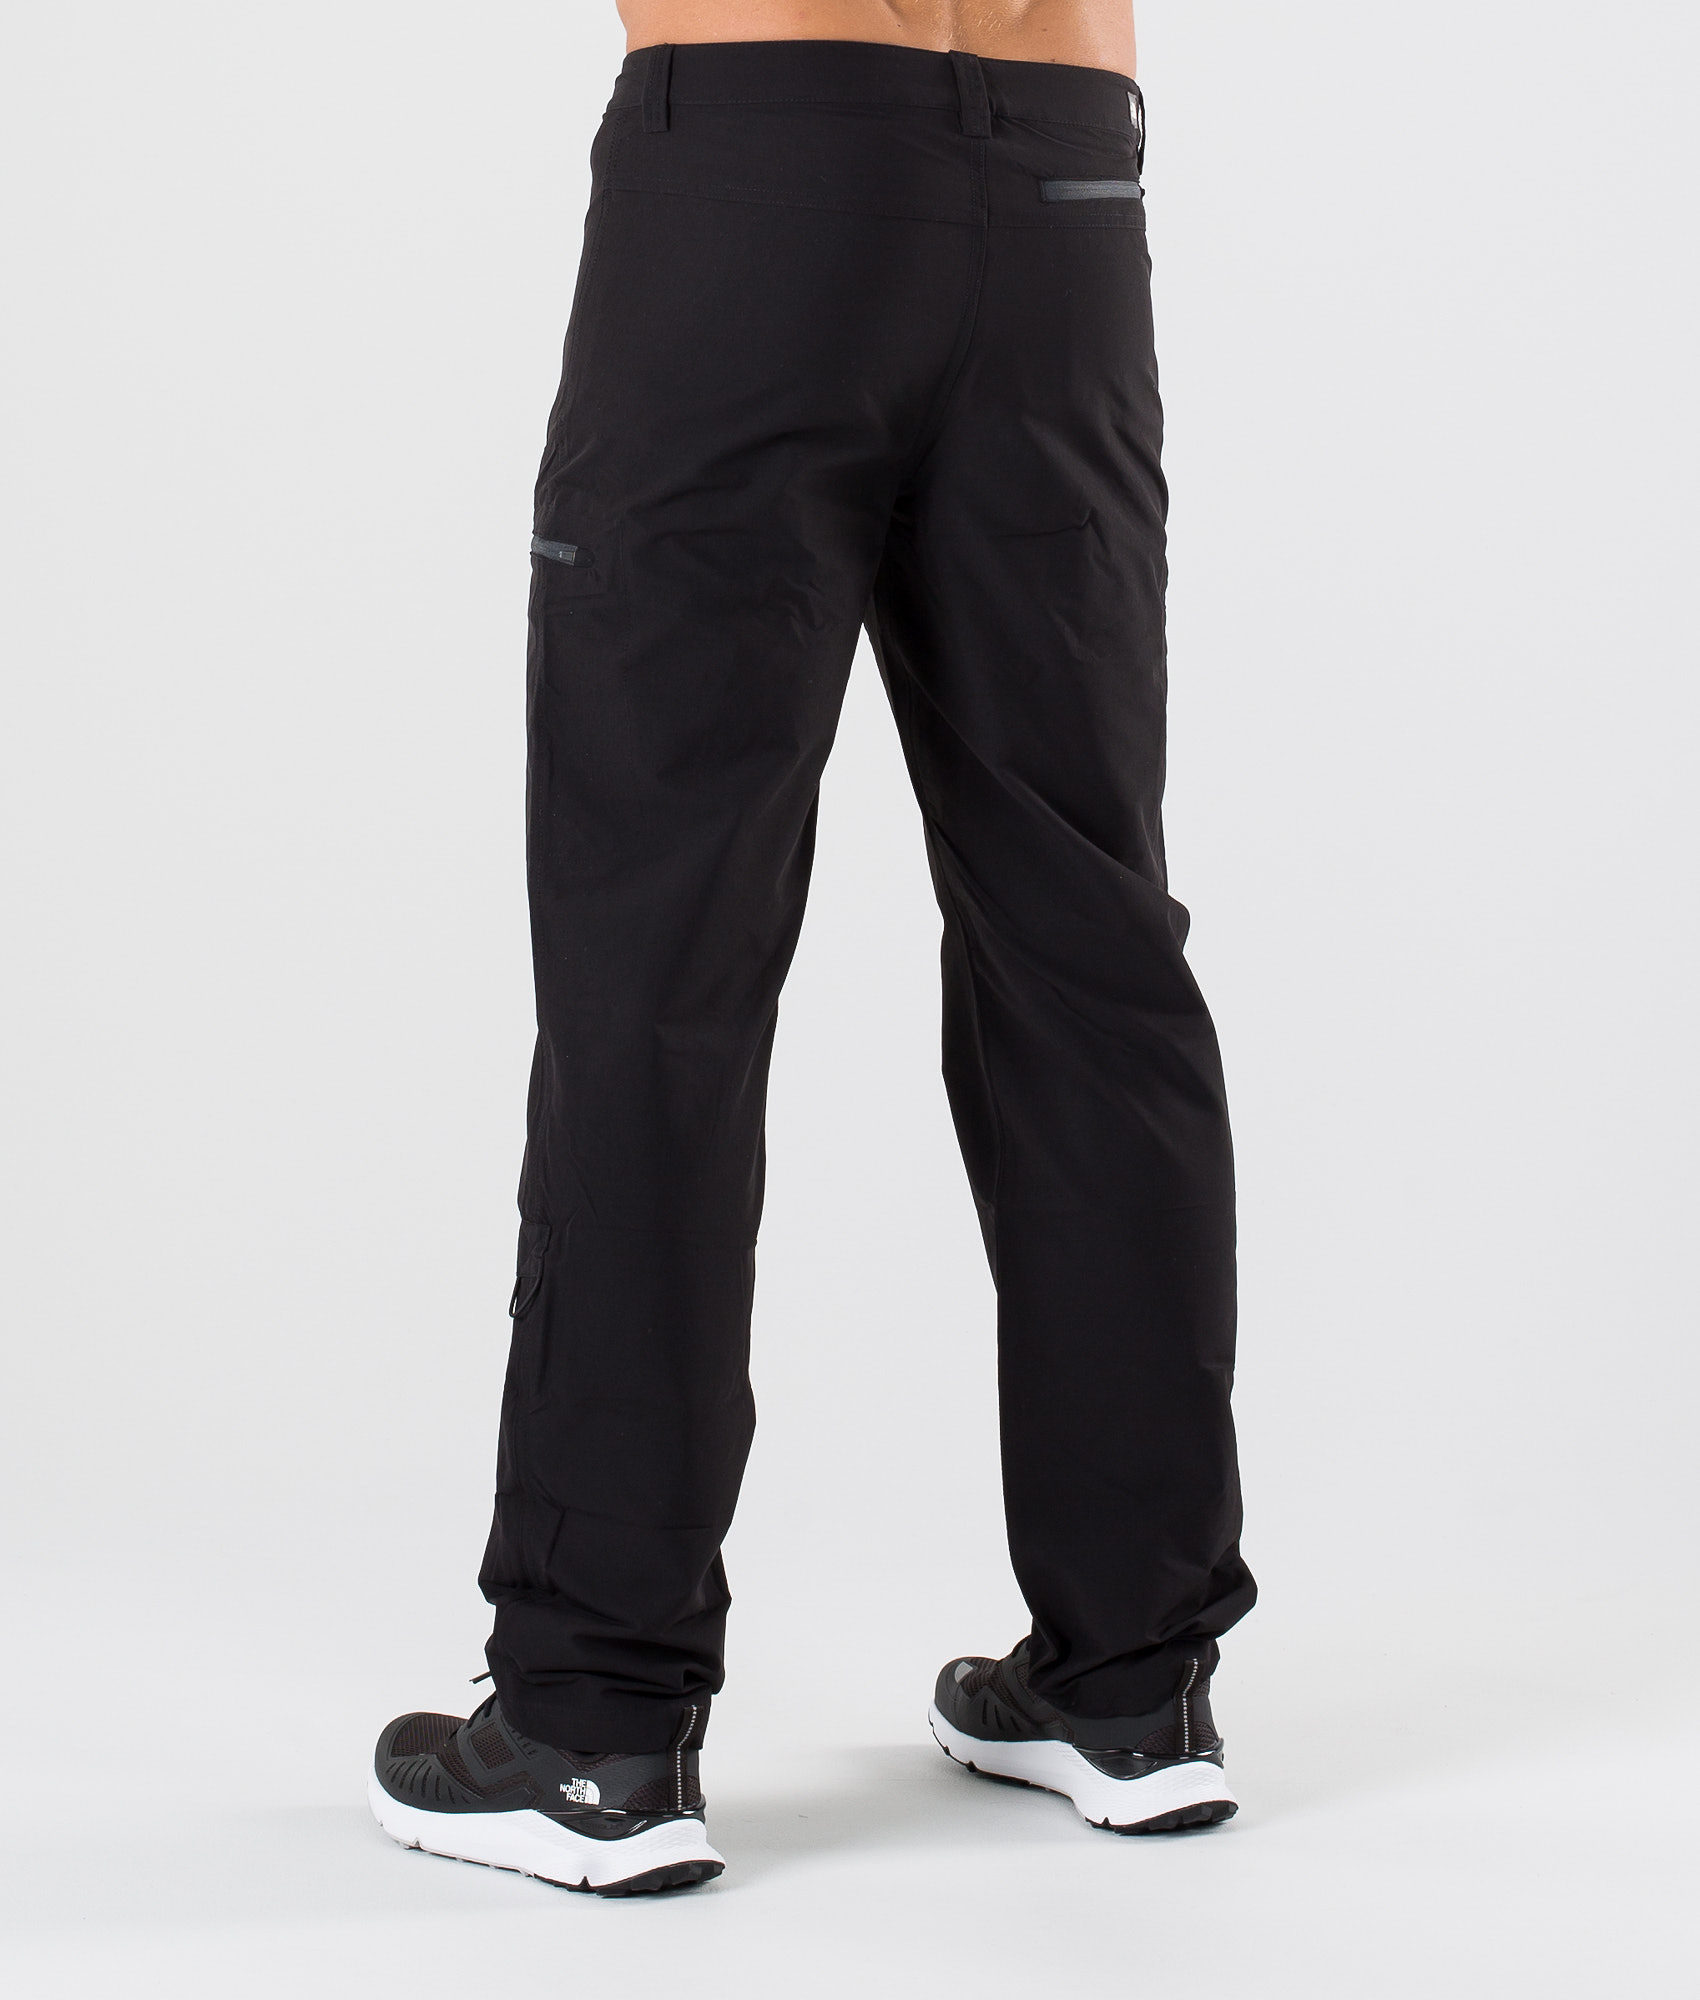 03e5e307 The North Face Exploration Pant Outdoor Trousers Tnf Black ...